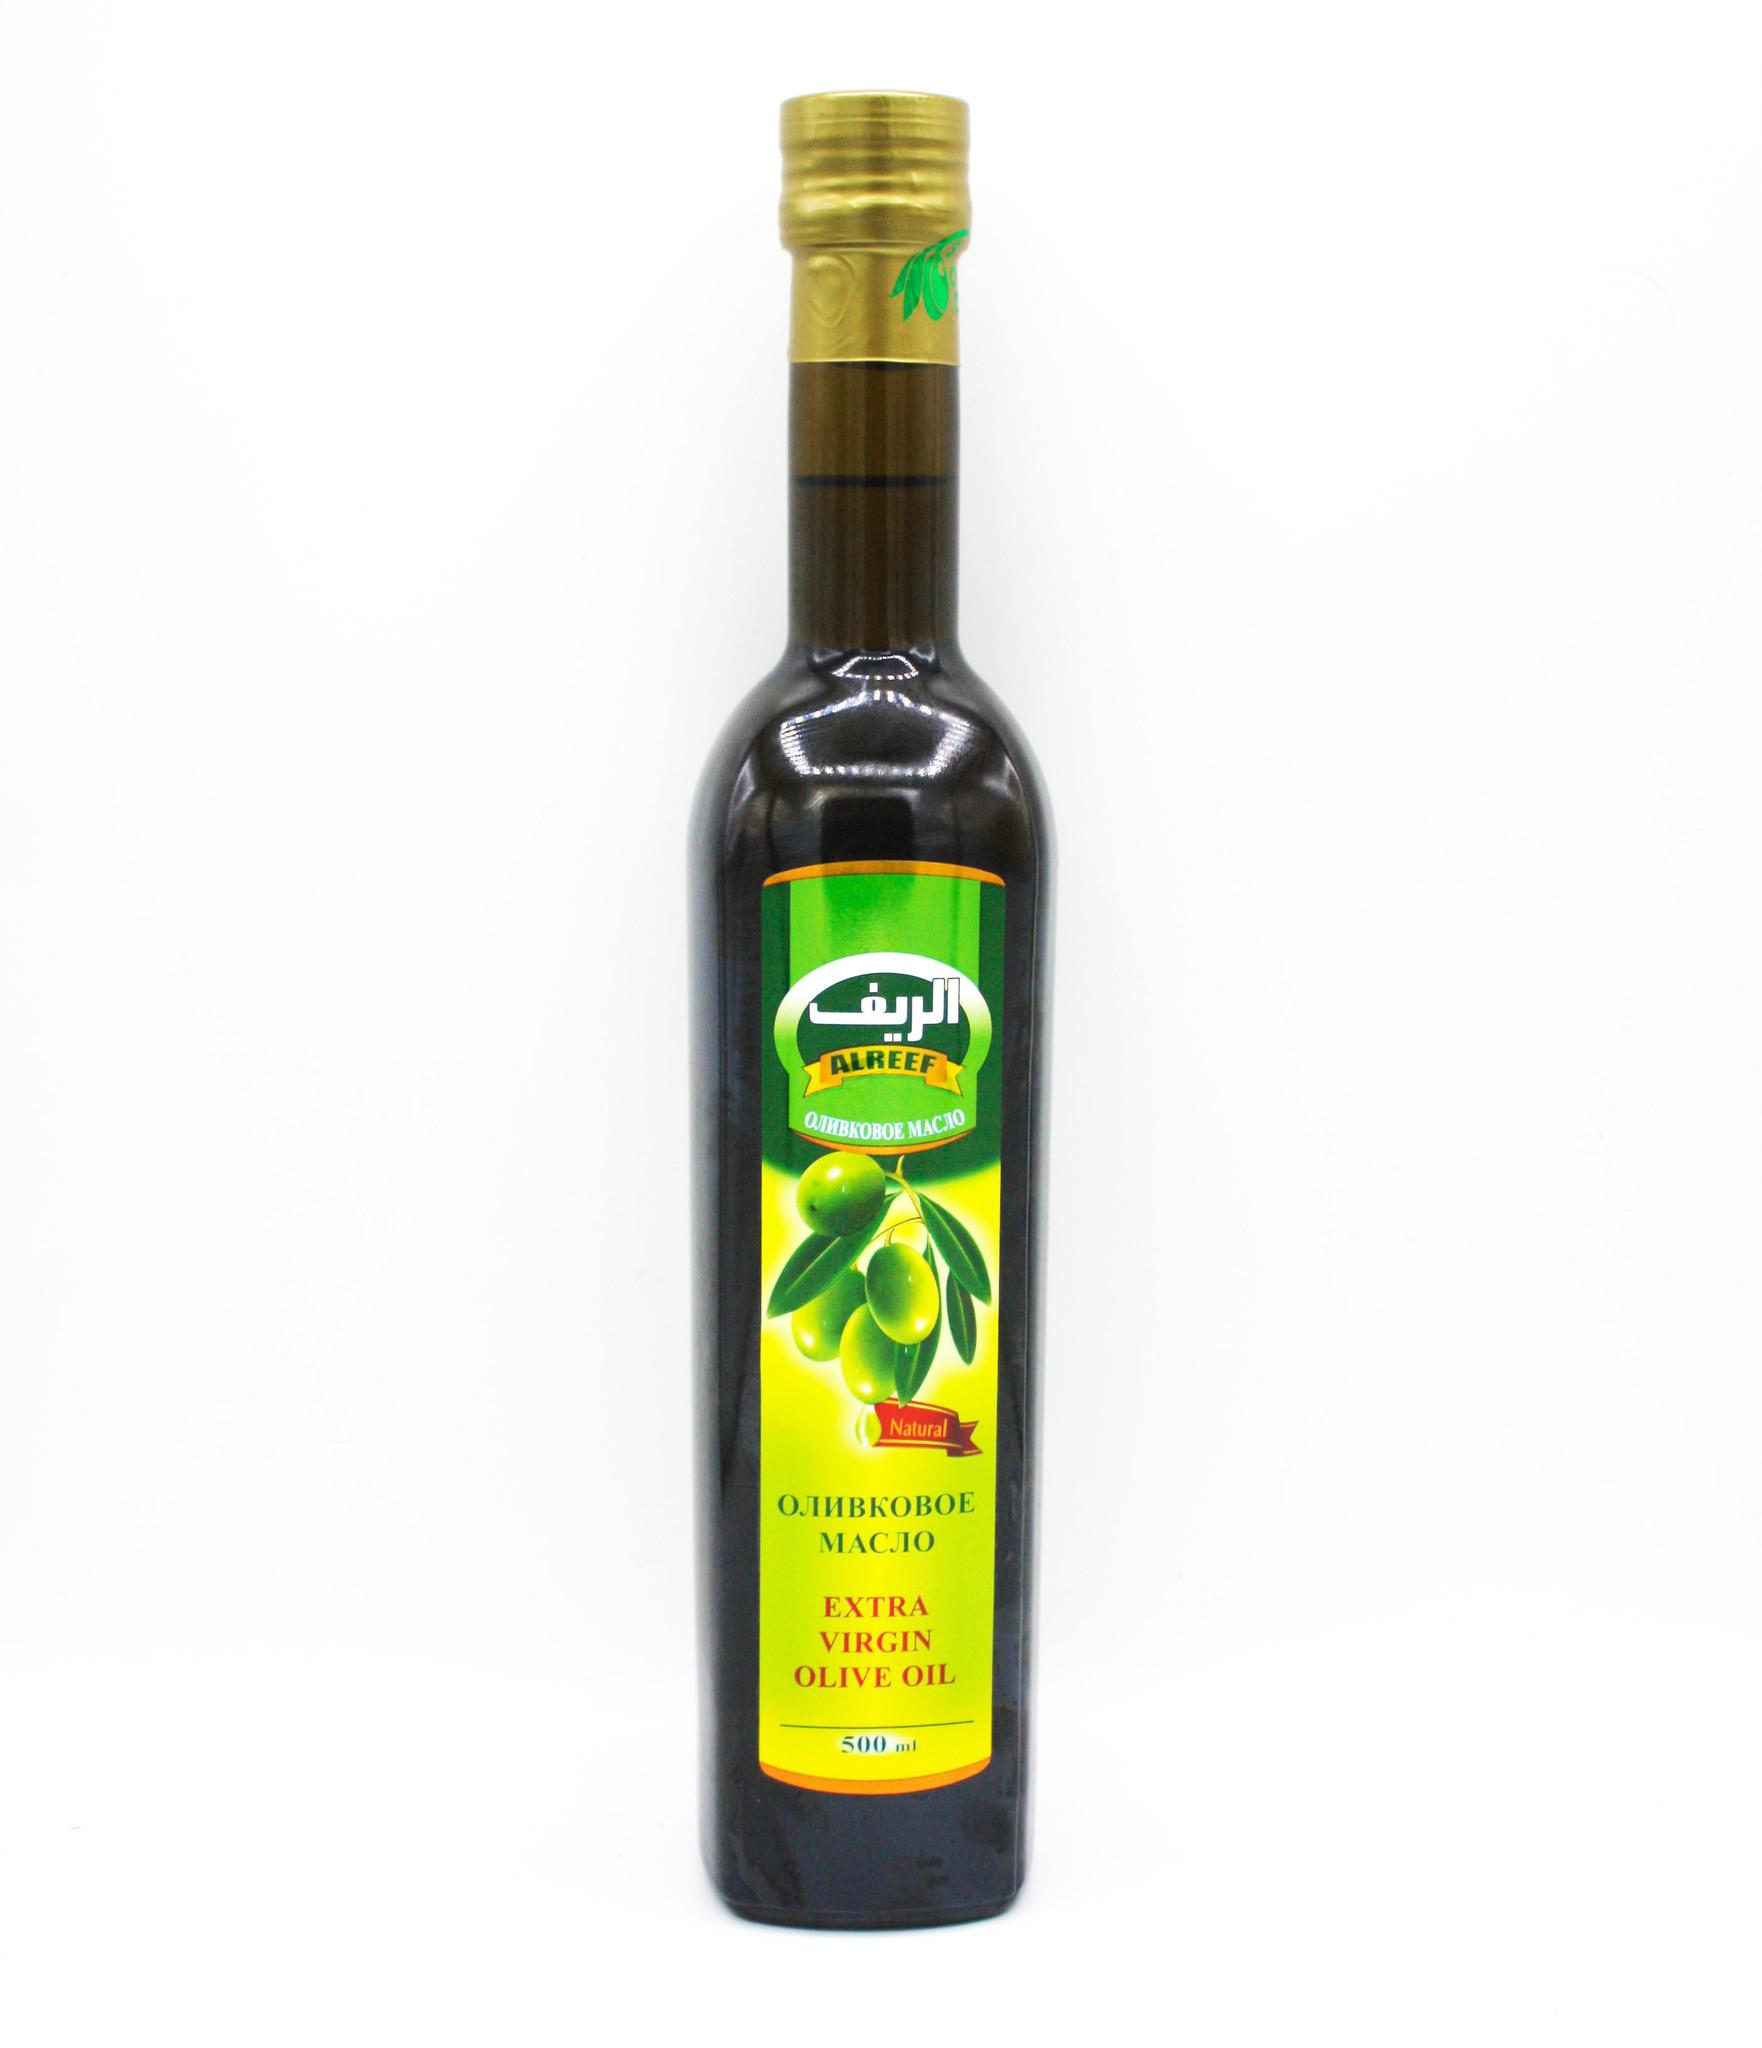 Оливковое масло Al Reef, 500 мл import_files_a2_a24b6a3e67e911e89d8f448a5b3752ae_da0404ca657a11e8a996484d7ecee297.jpg